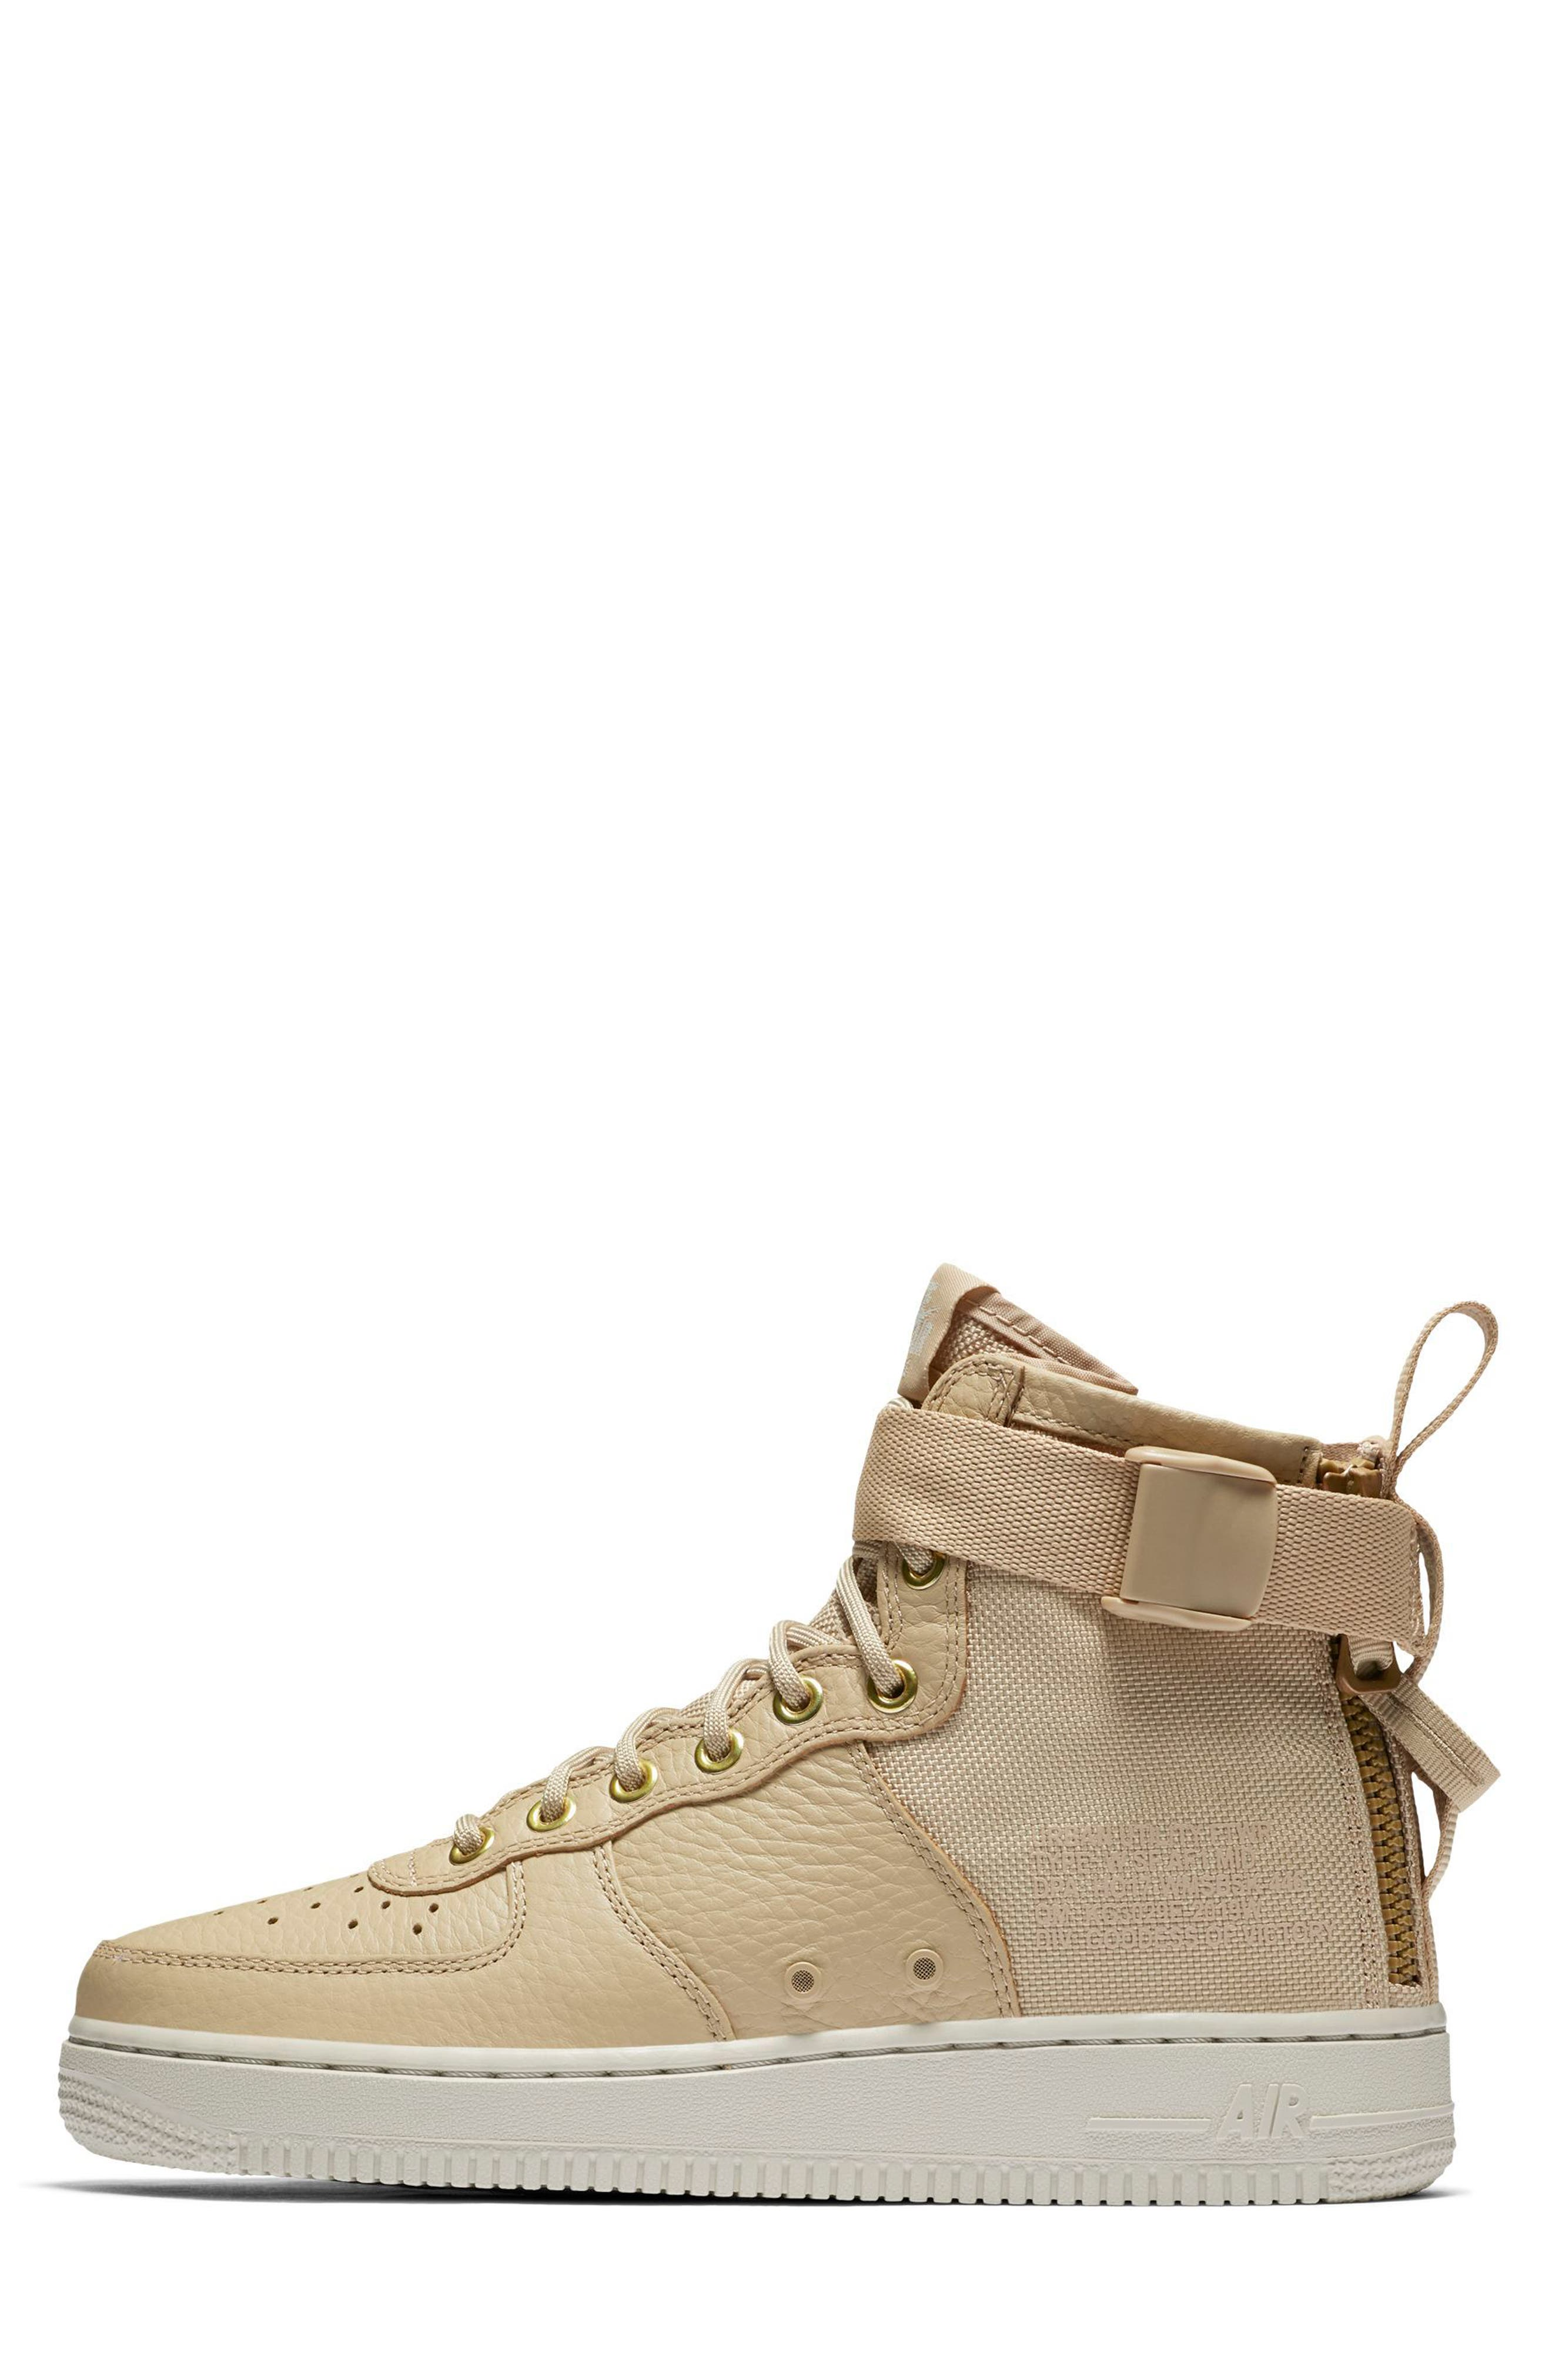 SF Air Force 1 Mid Sneaker,                             Alternate thumbnail 3, color,                             Mushroom/ Mushroom/ Light Bone